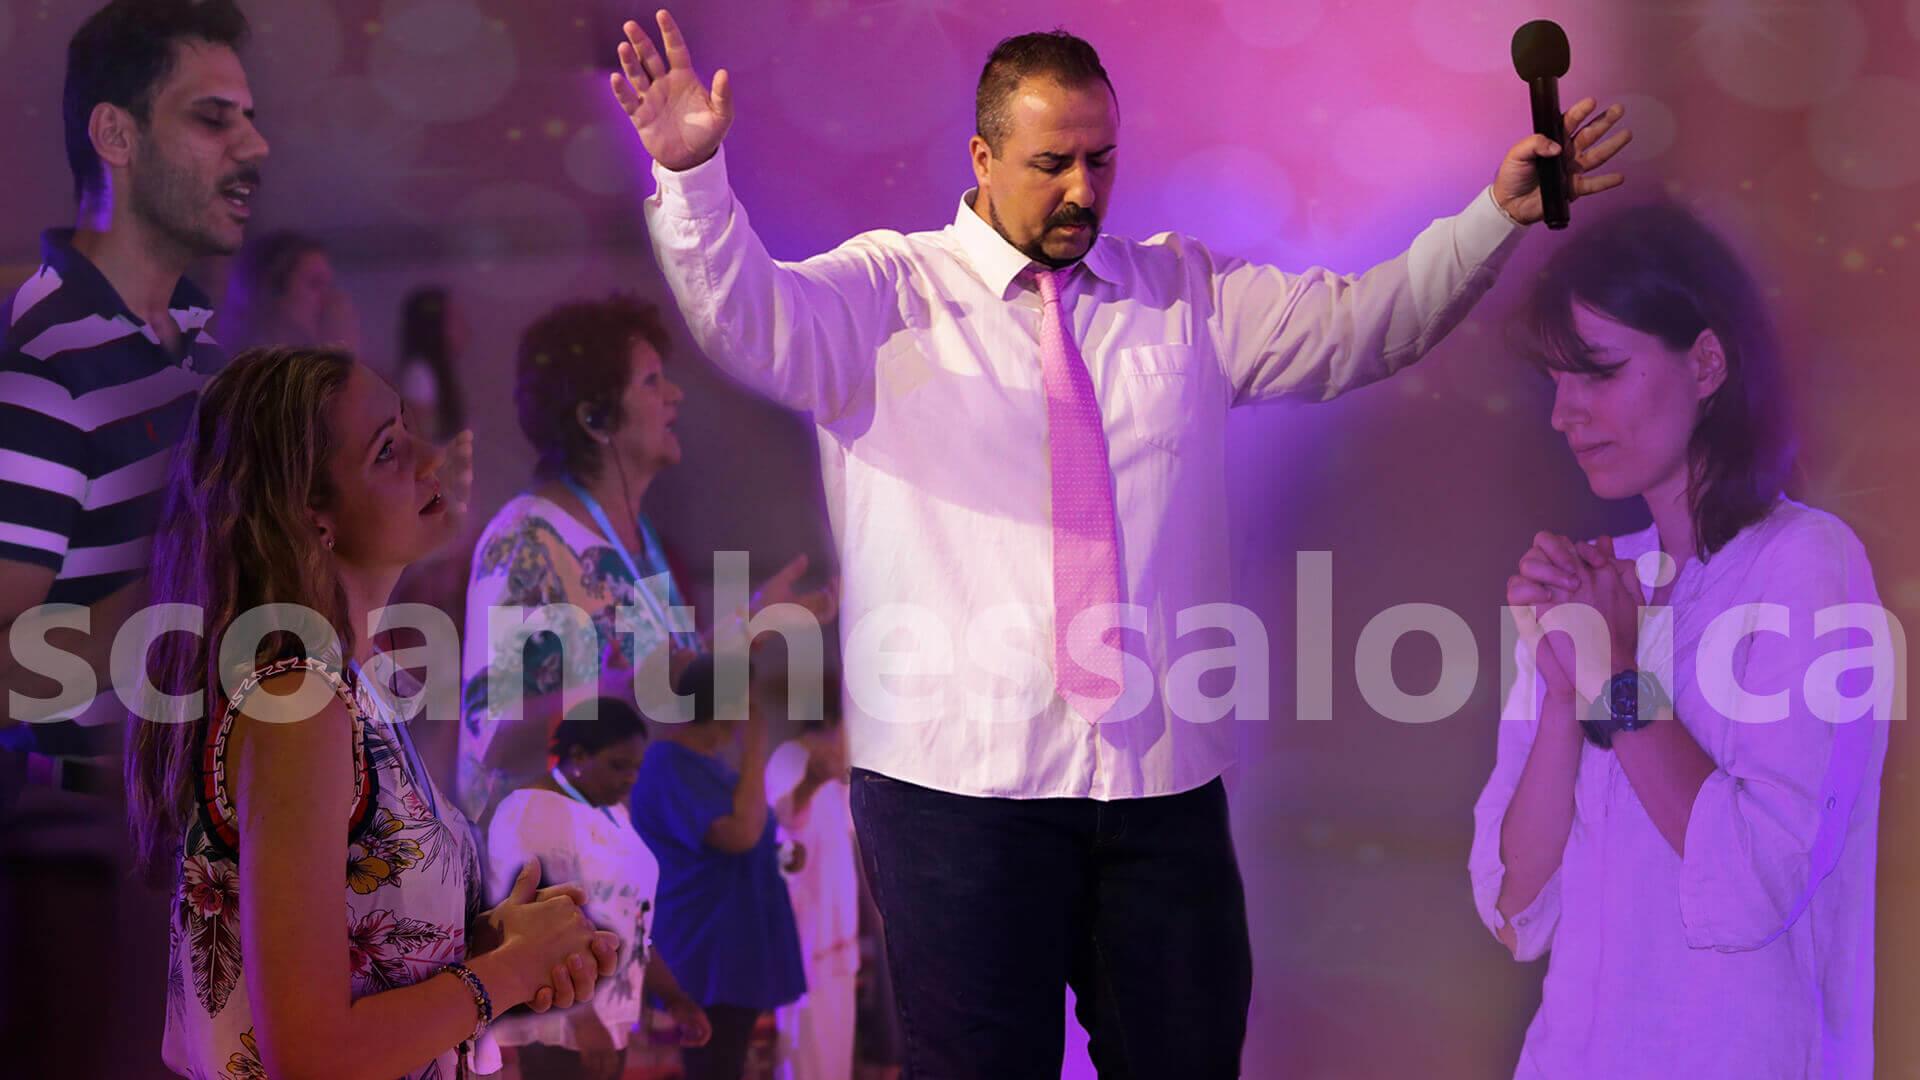 SCOAN_THESSALONICA_WORSHIP_2020_06_28